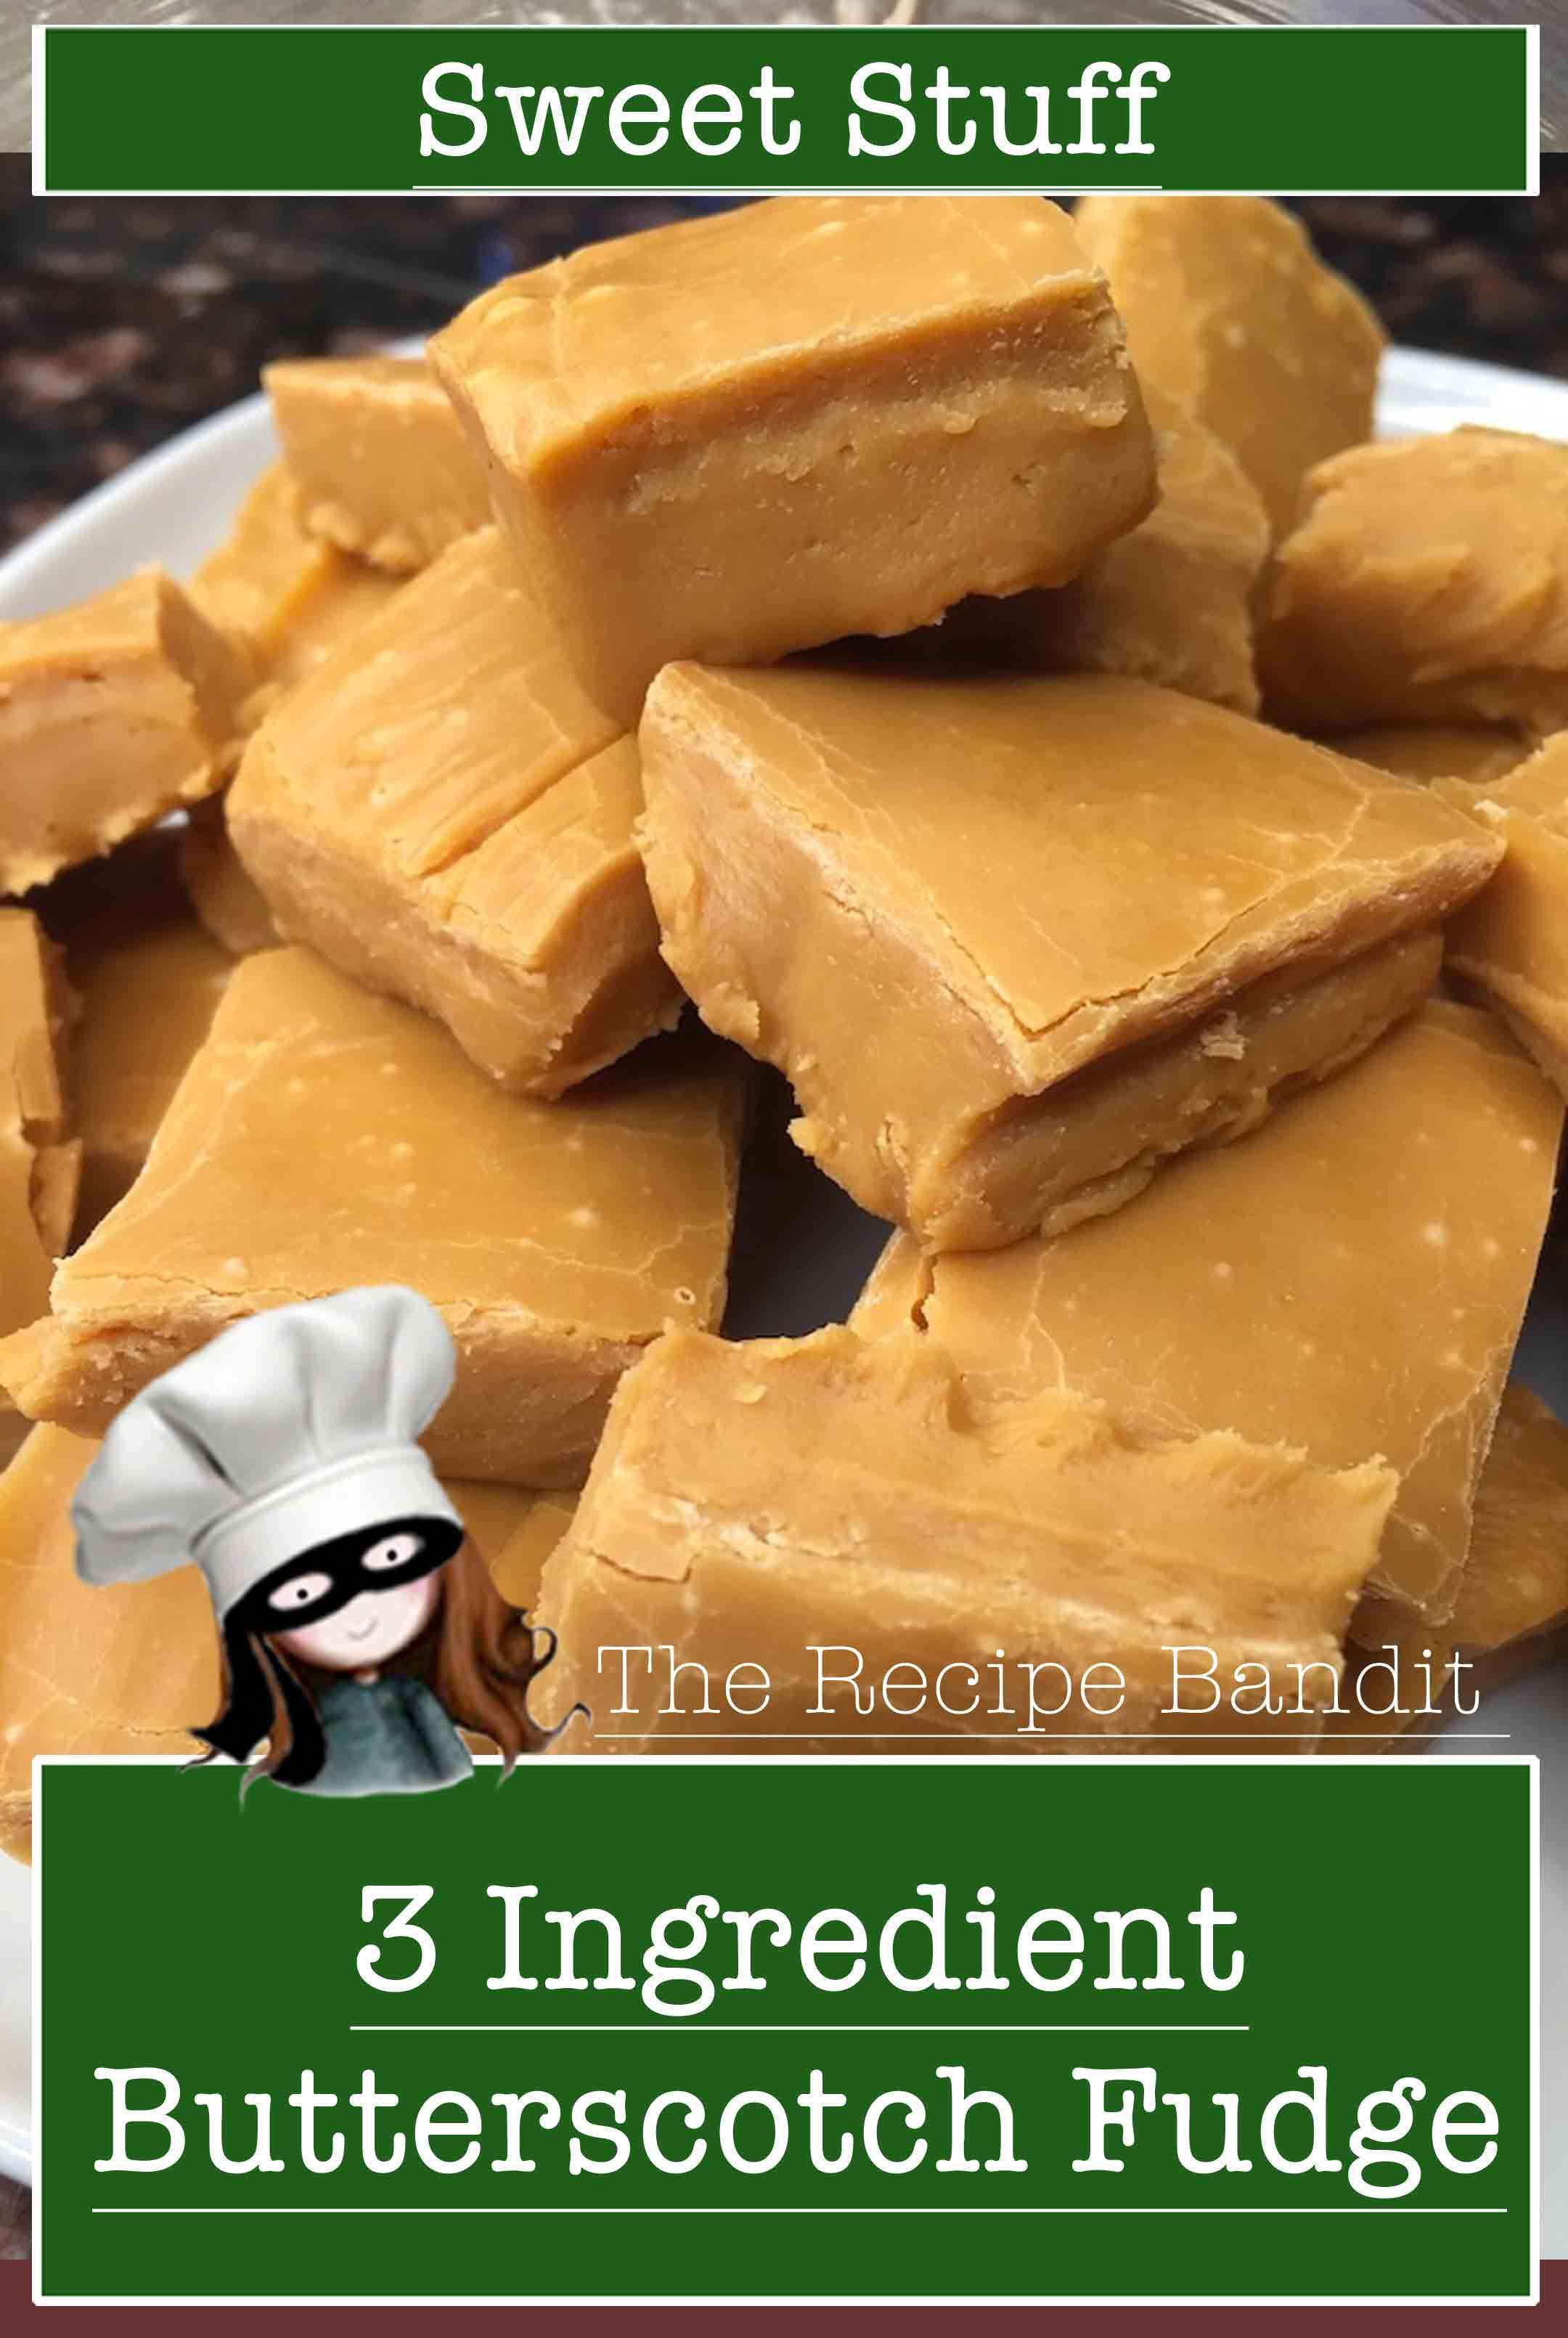 3 Ingredient Butterscotch Fudge Recipe Butterscotch Fudge Fudge Recipes Fudge Easy